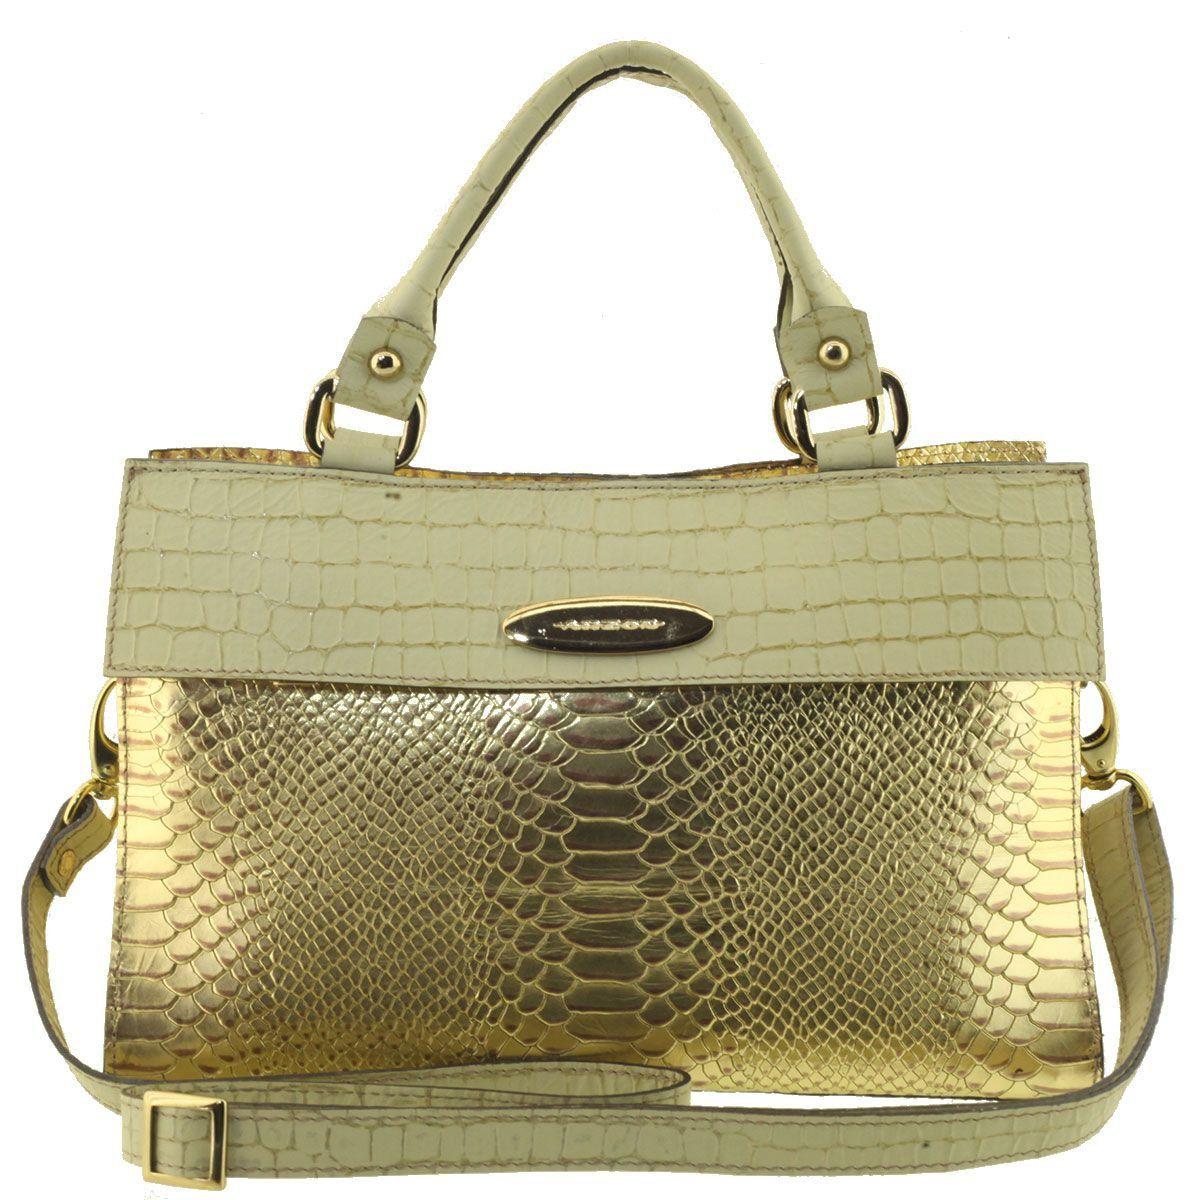 Bolsa Couro Feminina Dourada